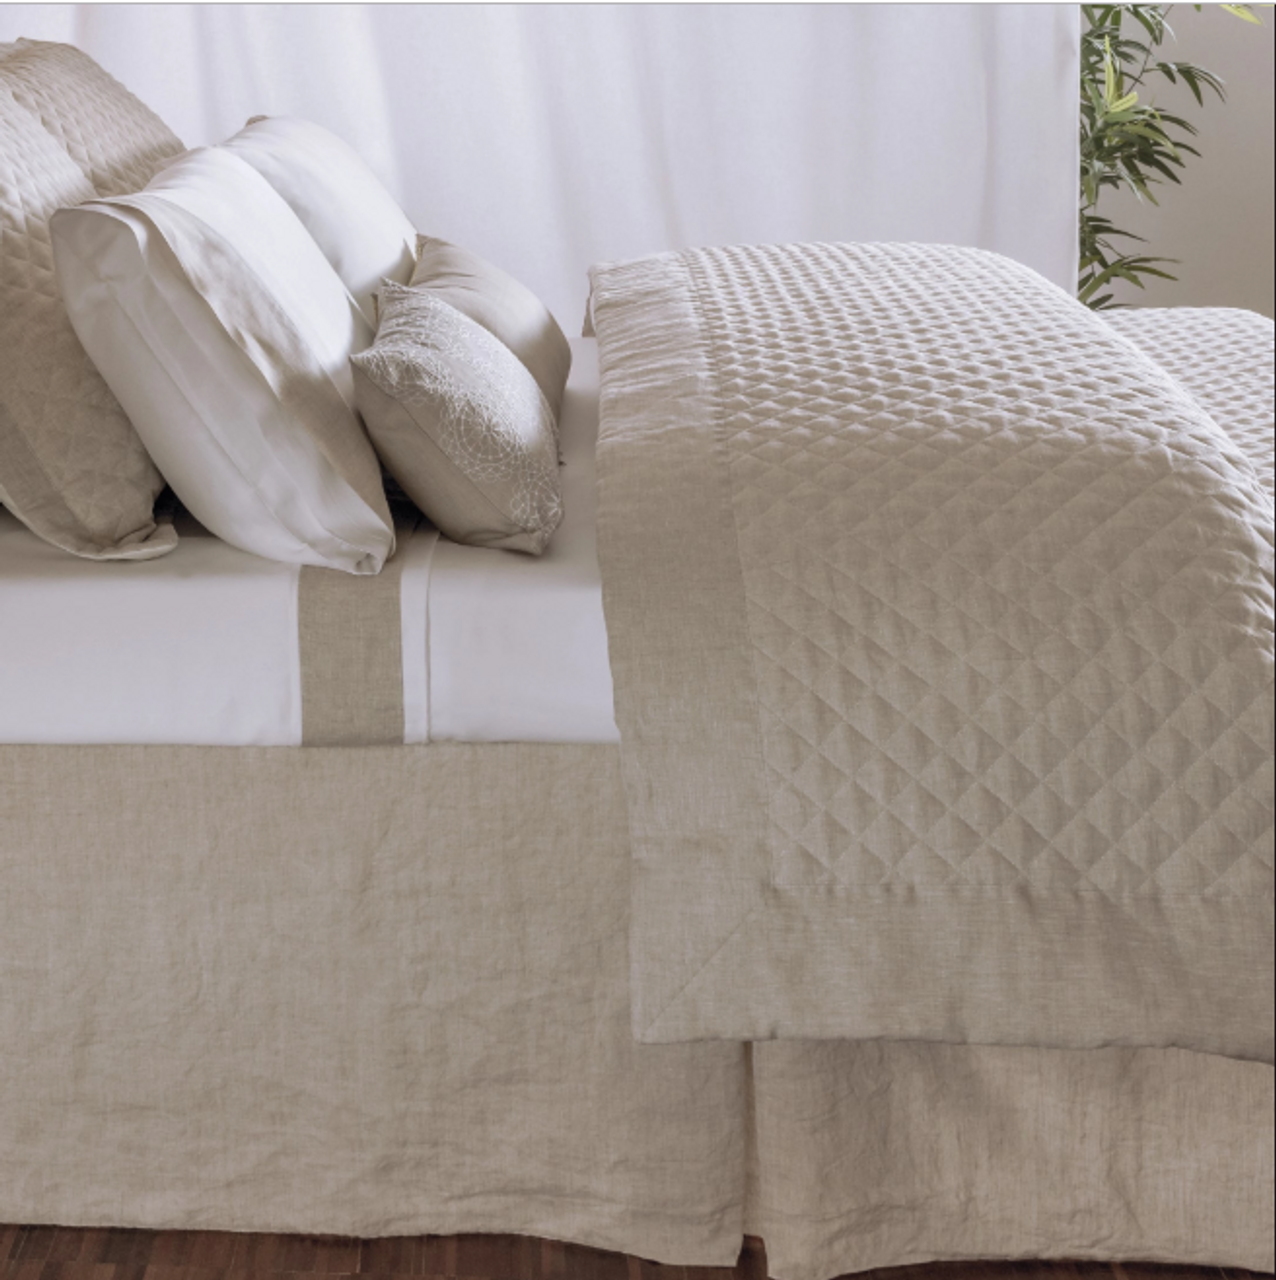 BLACK FOREST DECOR Desert Jewel Woven Bedspread Queen